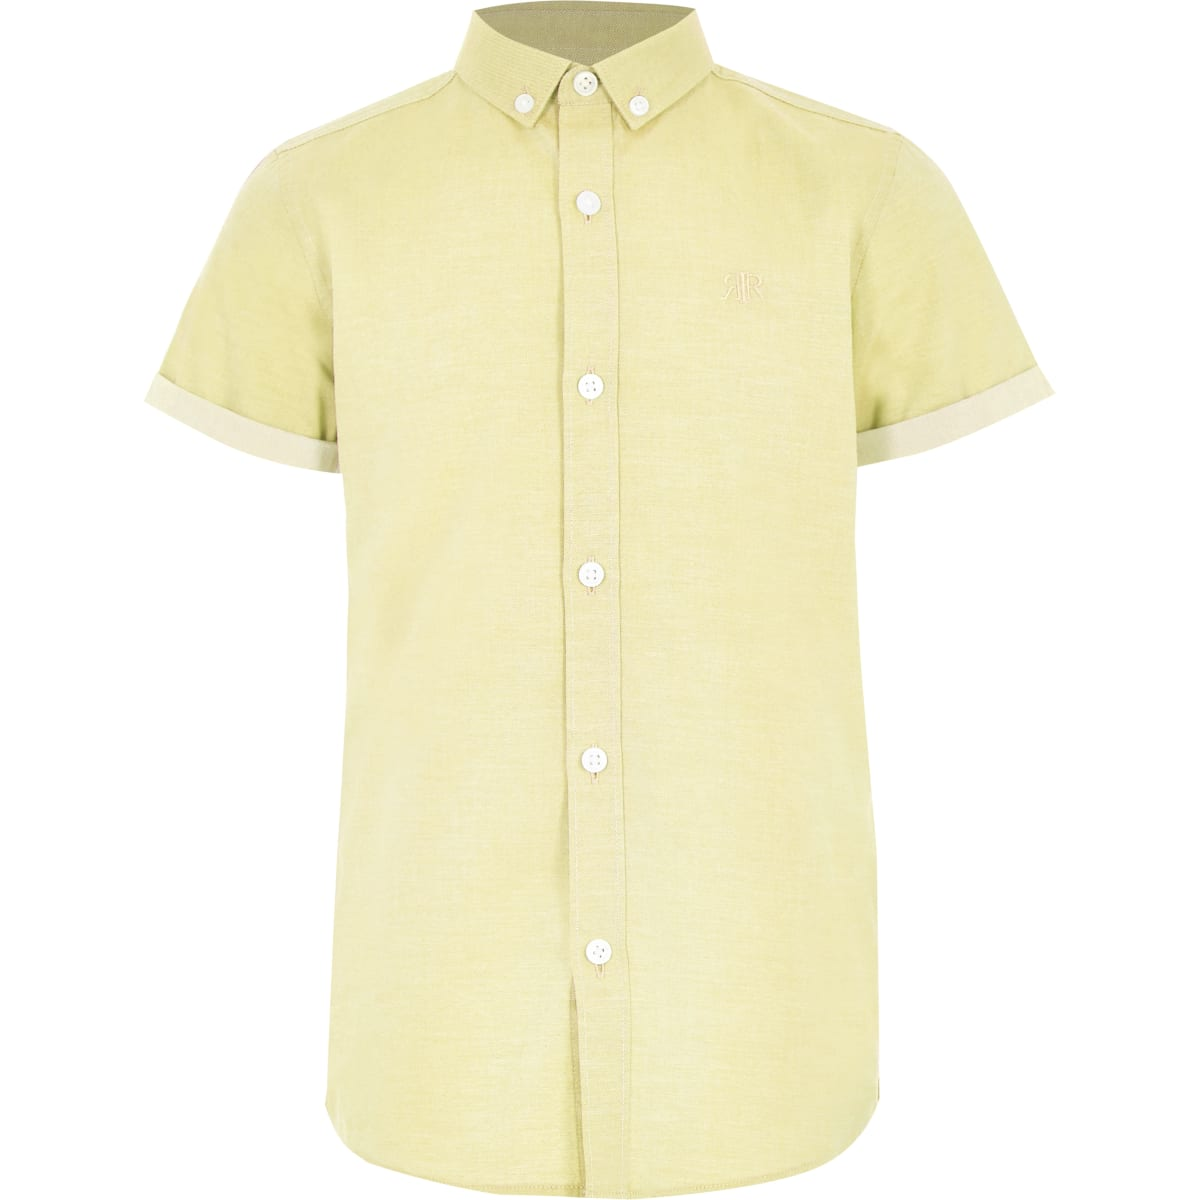 Boys yellow RI short sleeve shirt